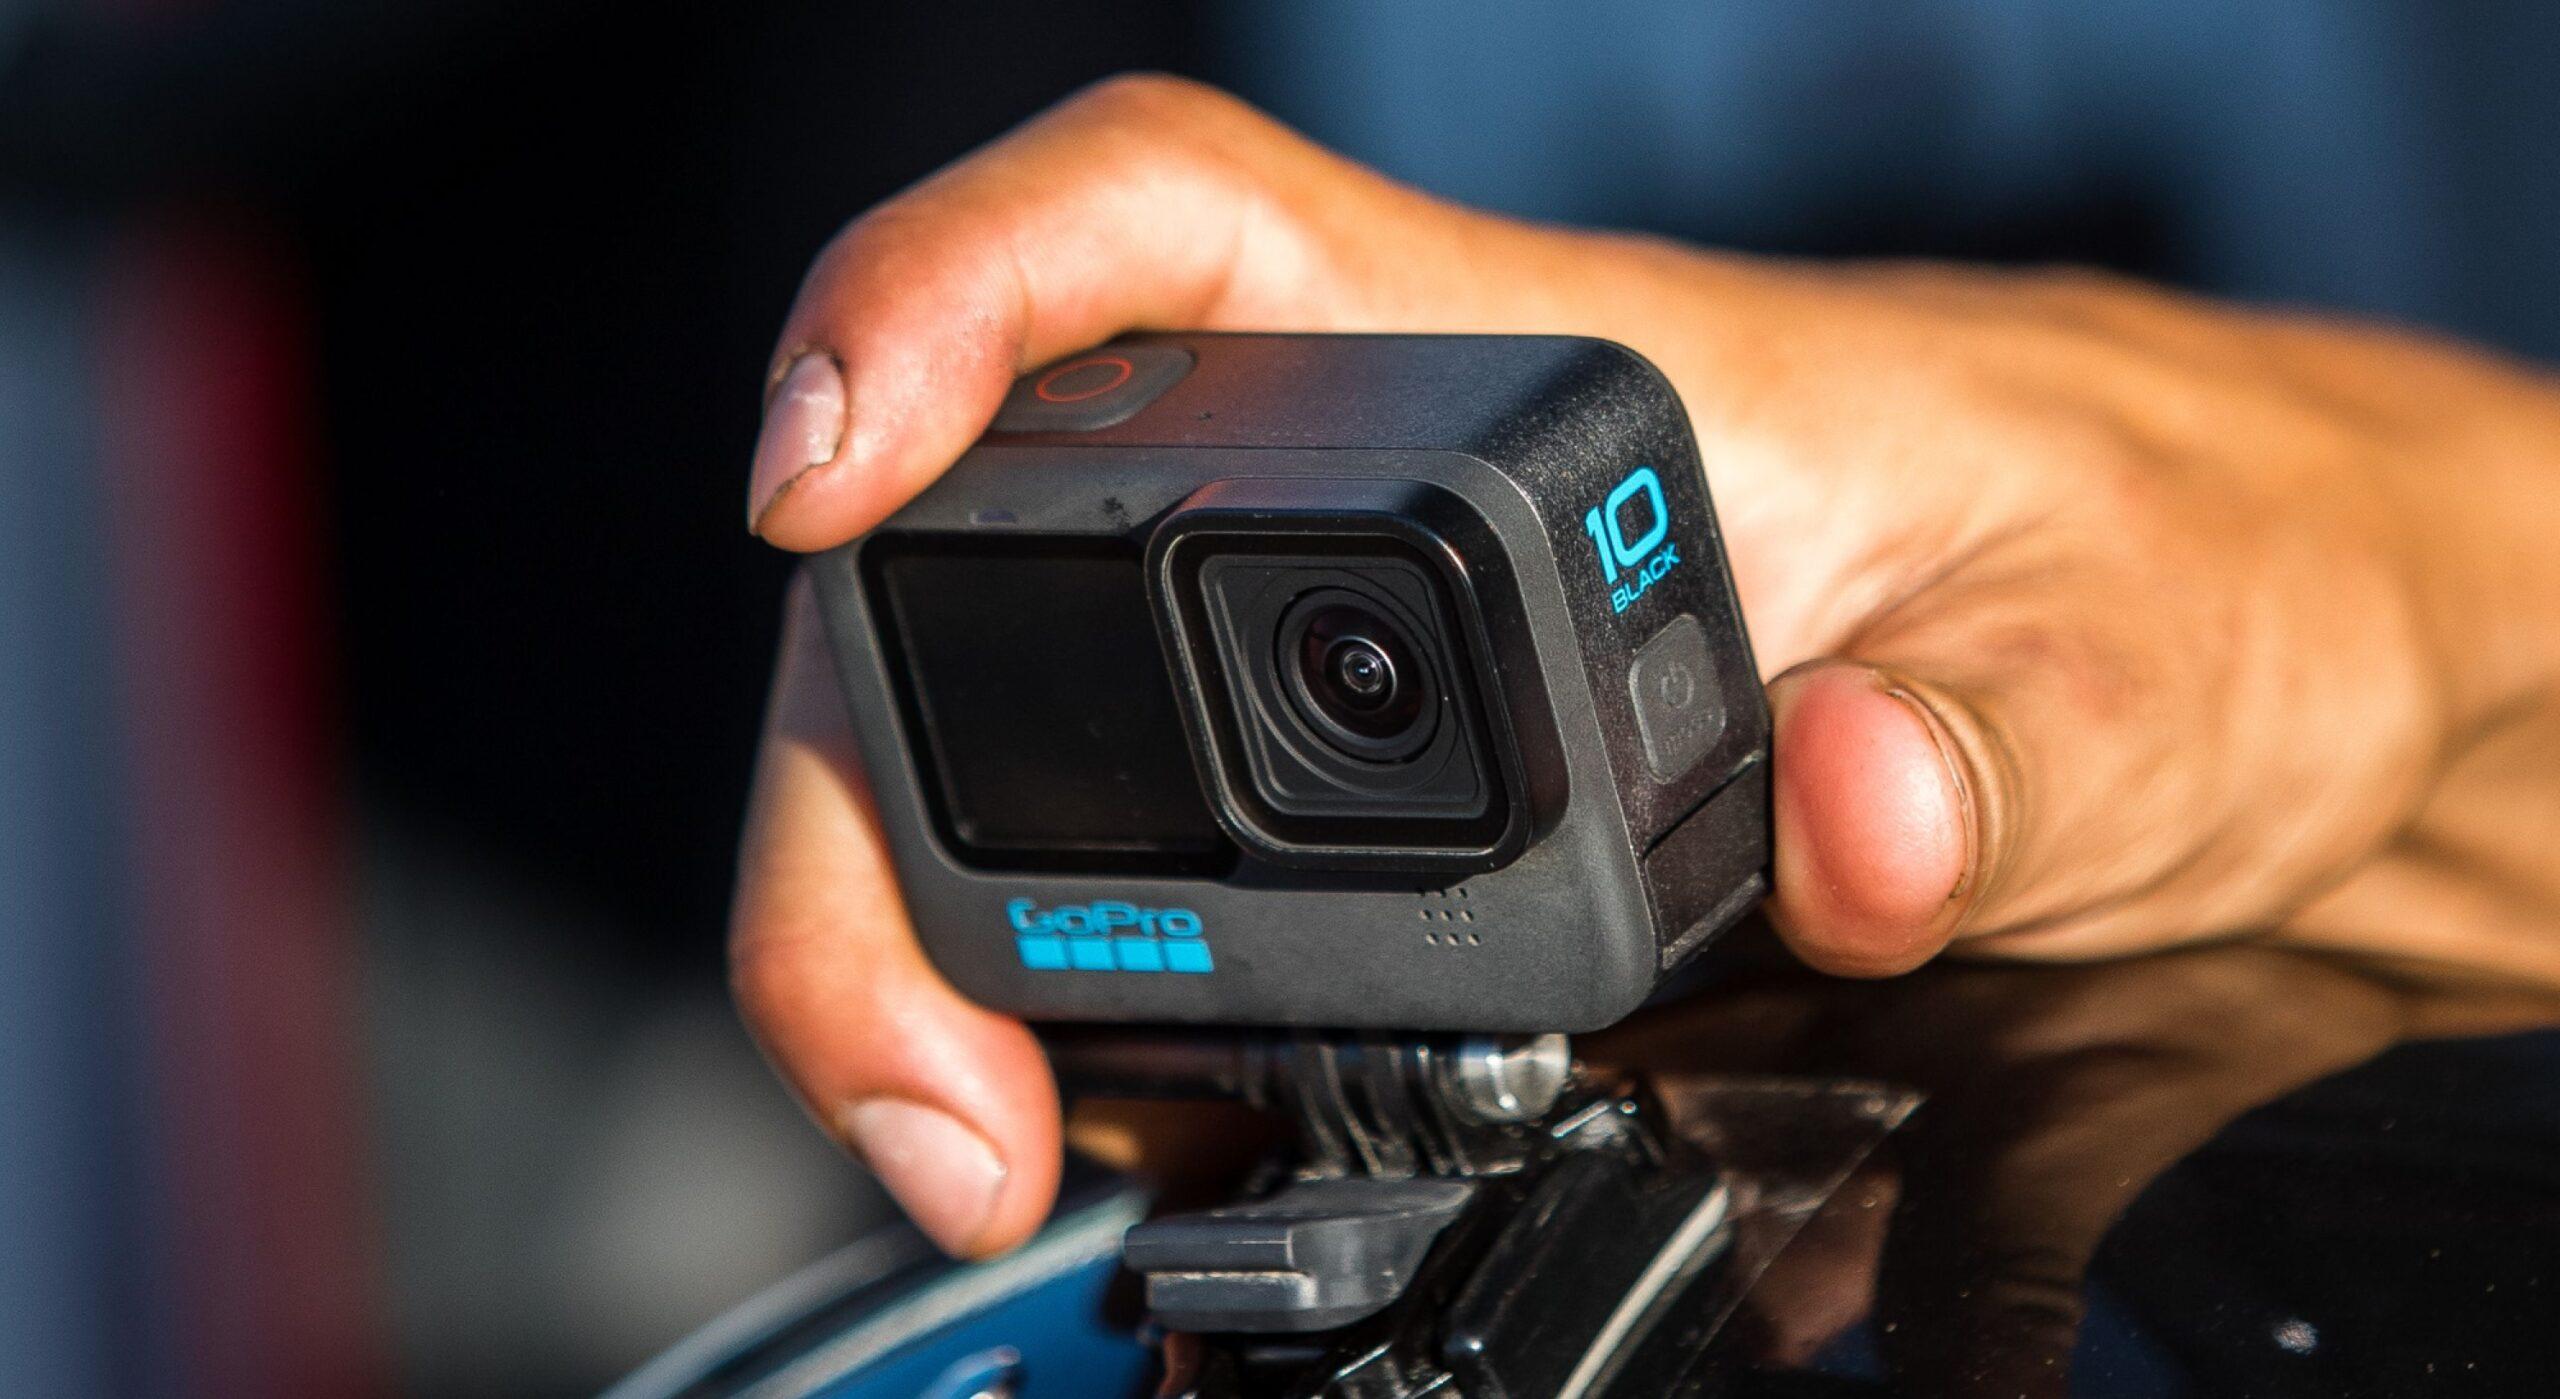 The new GoPro HERO10 Black